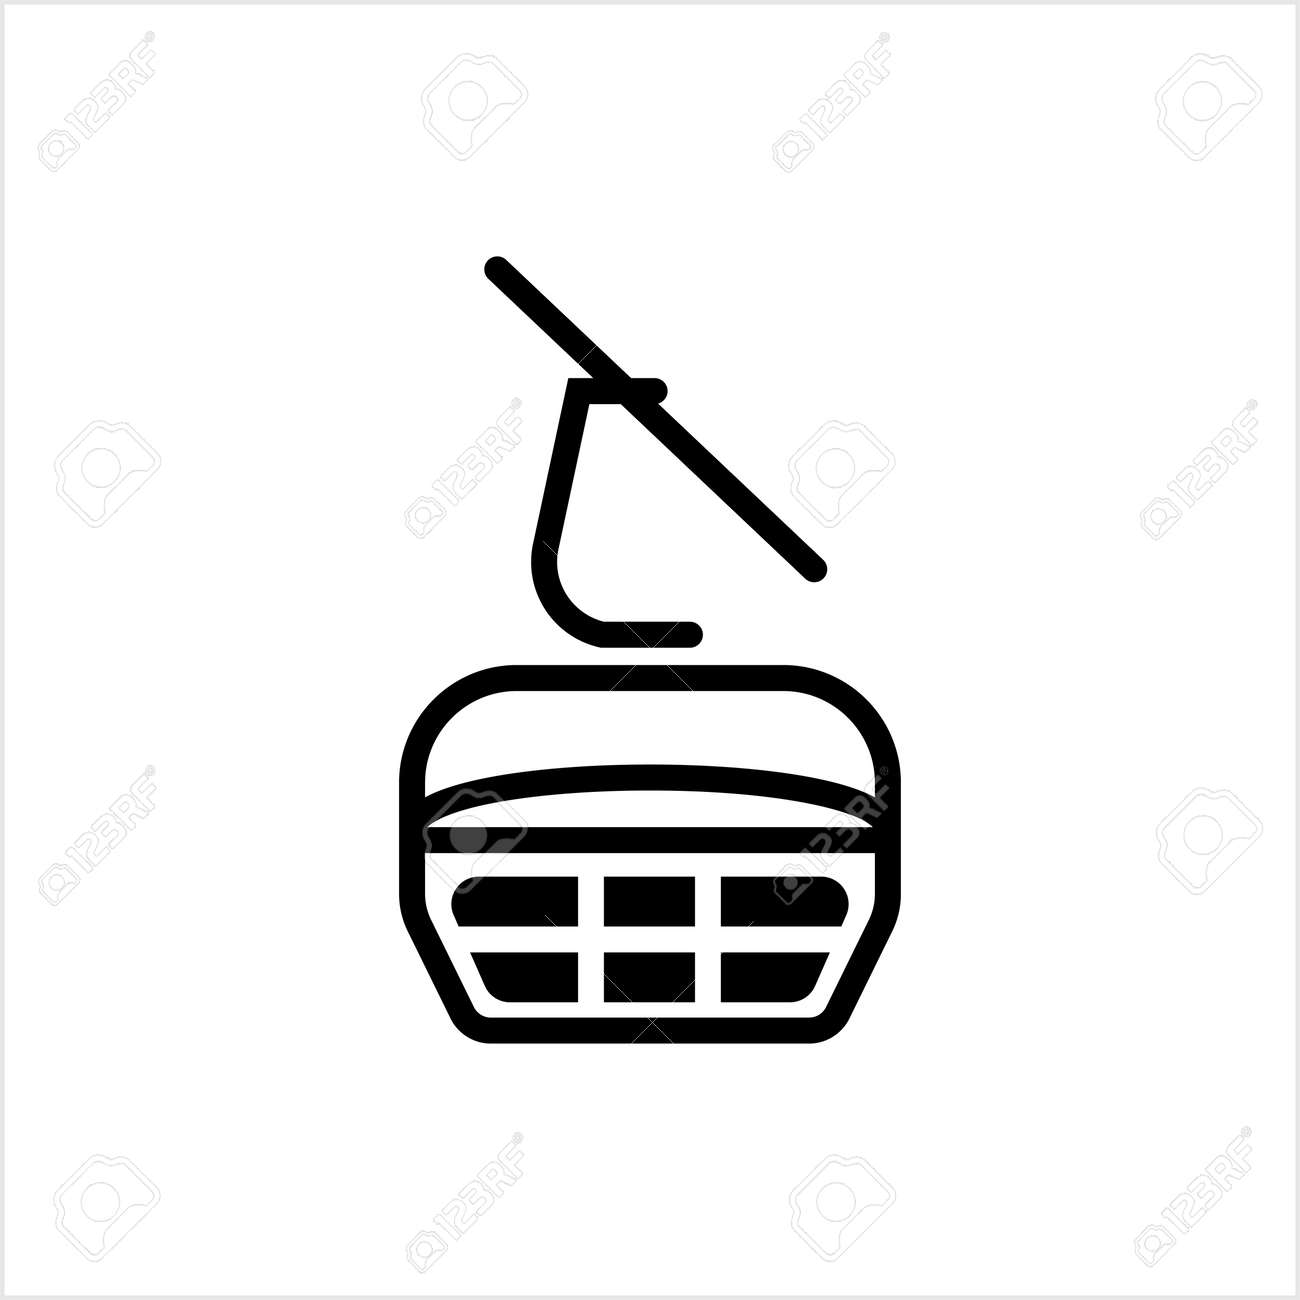 Ski Lift Icon, Aerial Lift Icon Vector Art Illustration - 149571108